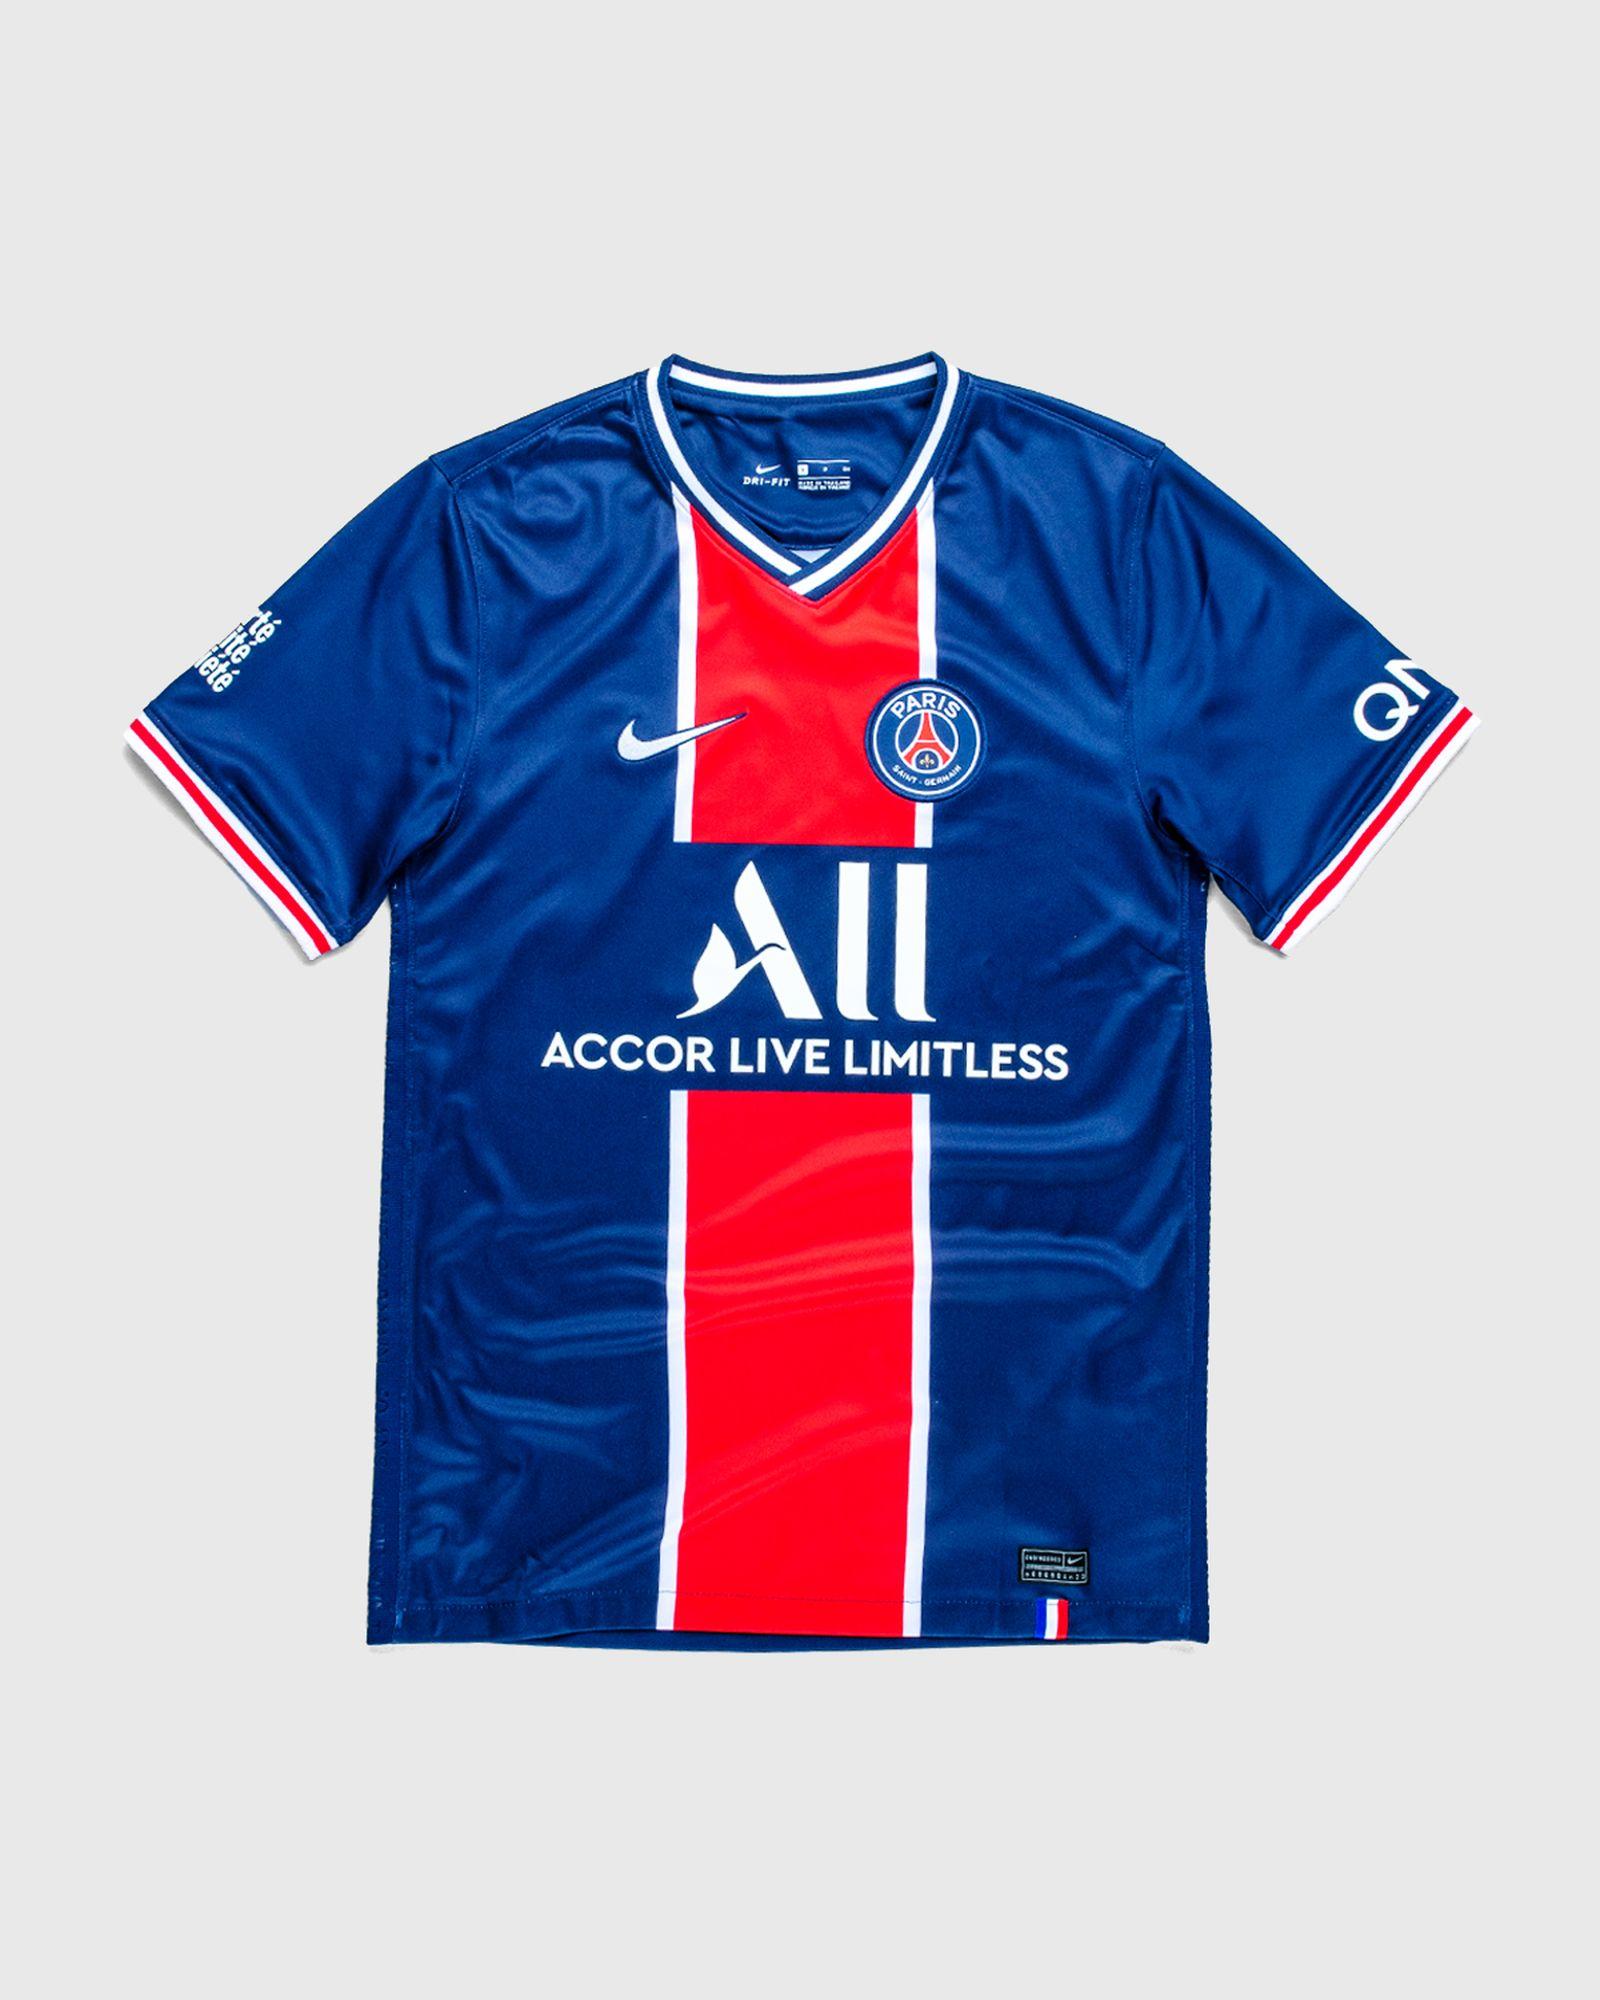 not-in-paris-releases-psg-jersey-01